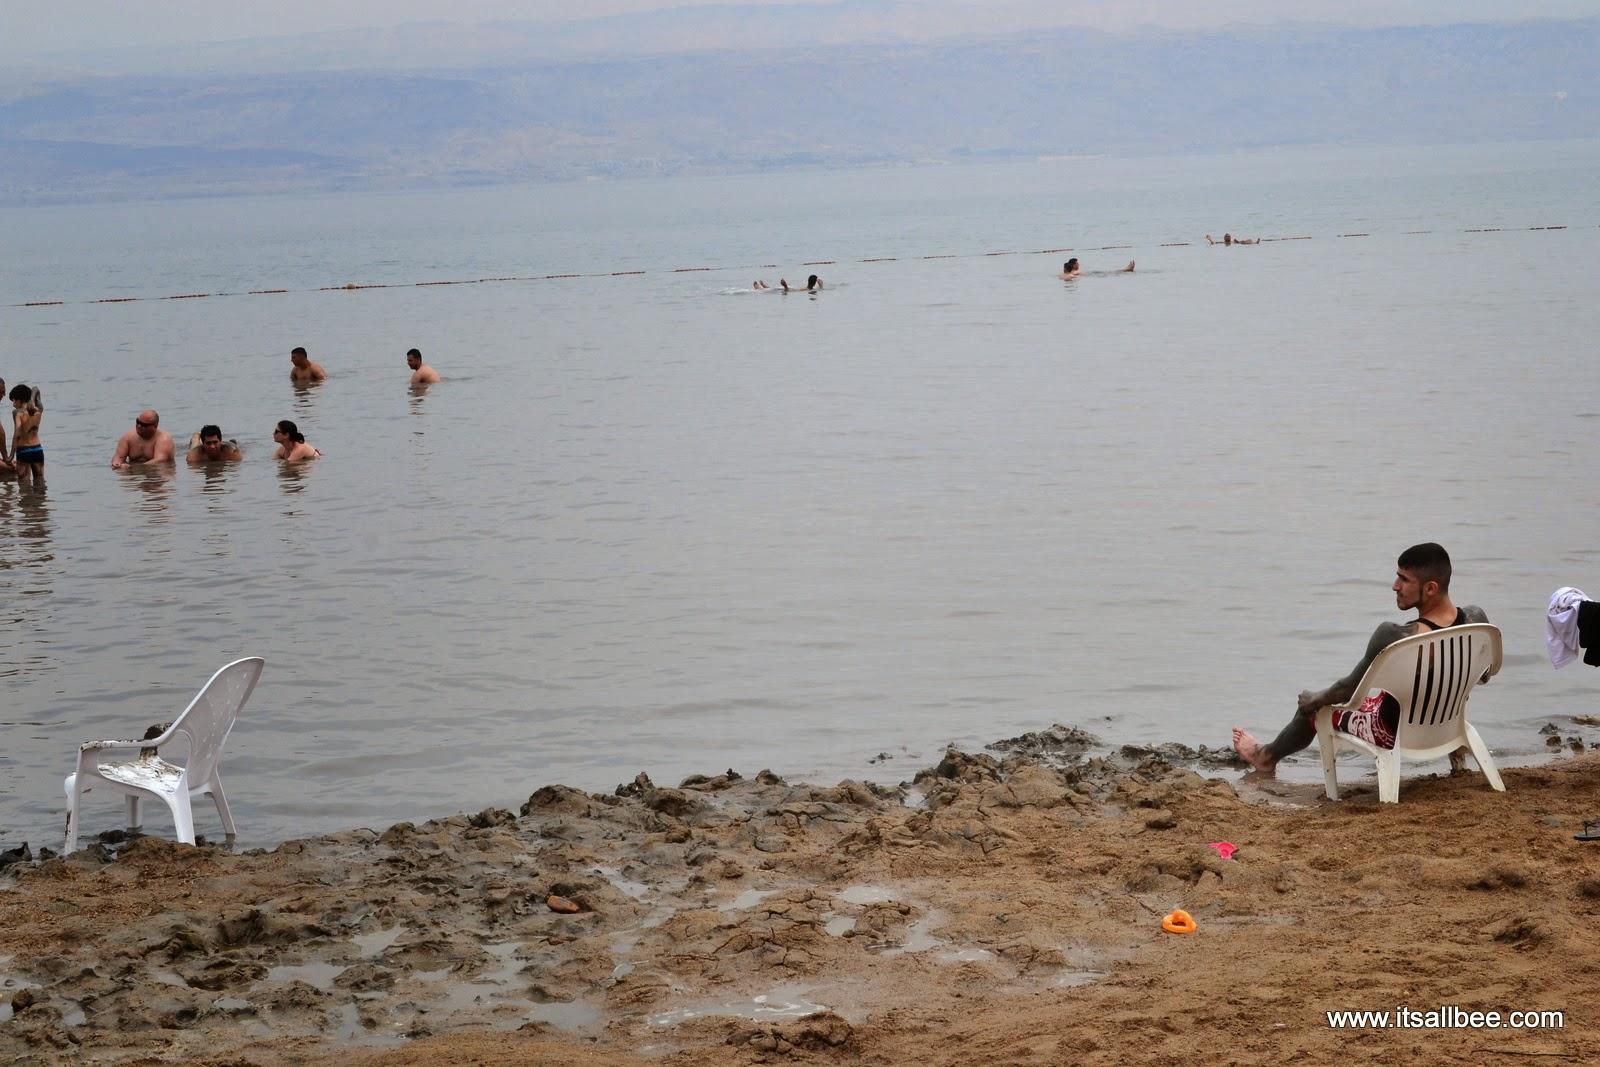 Floating in Israel's Dead Sea